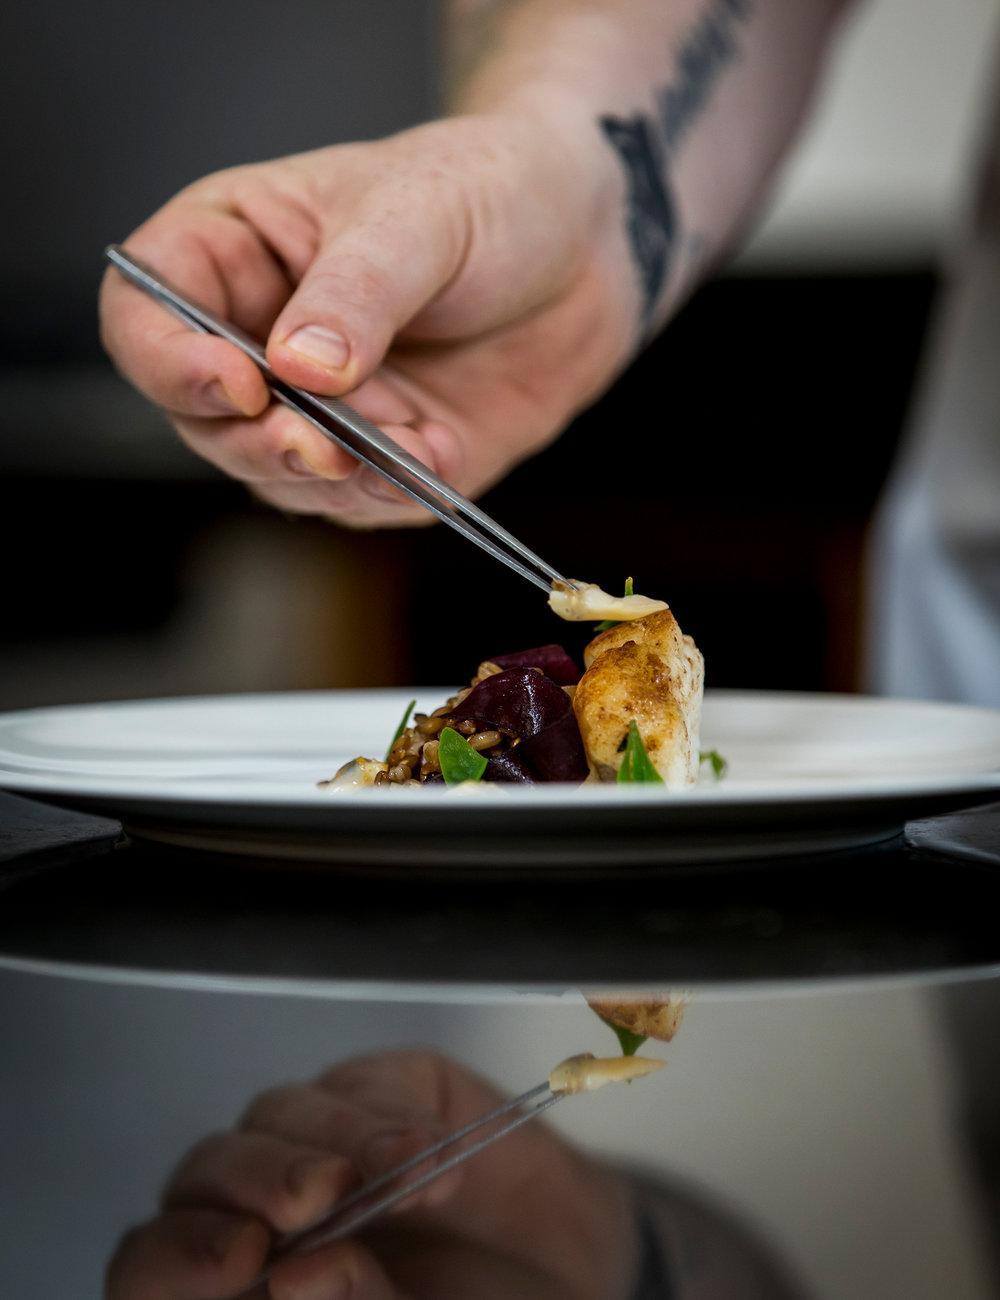 Healthy Appetite for RTÉ